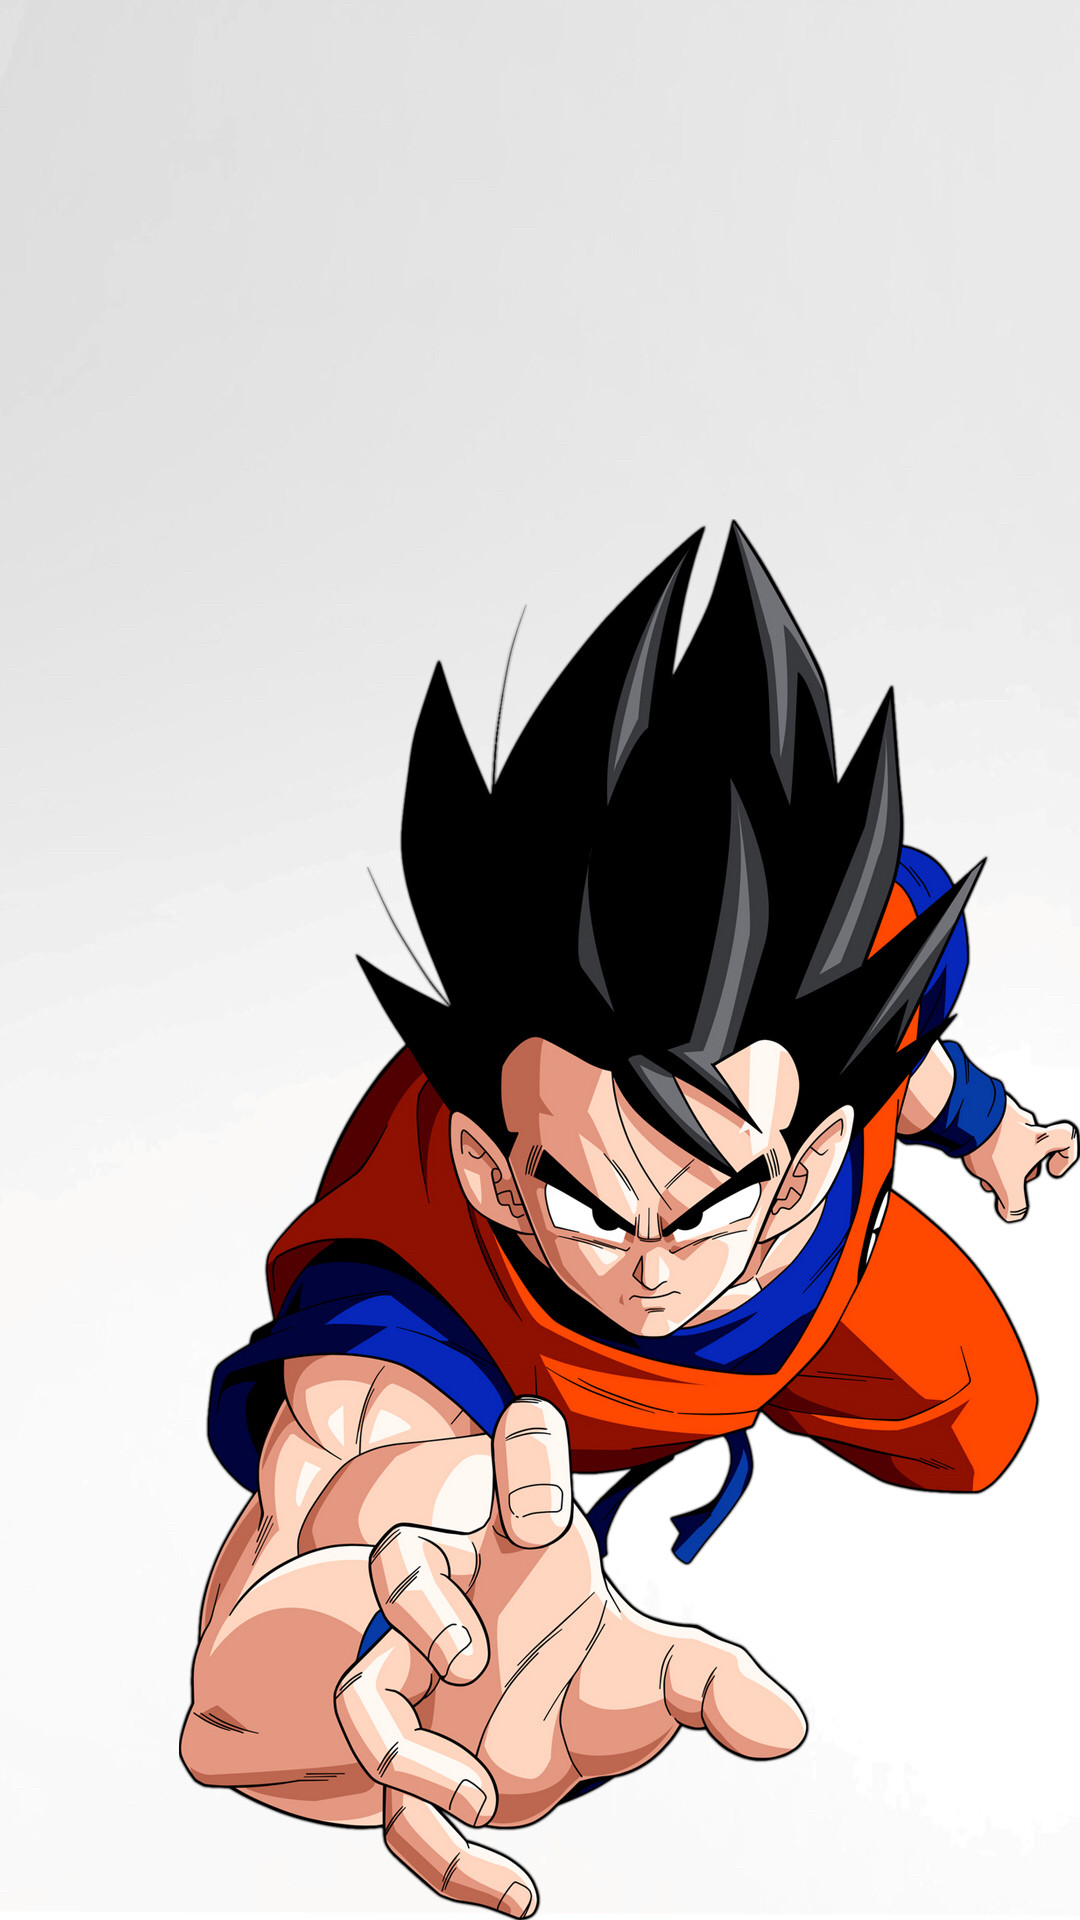 Res: 1080x1920, ...  Goku Wallpaper iPhone 6 plus. Places to Visit Pinterest Goku